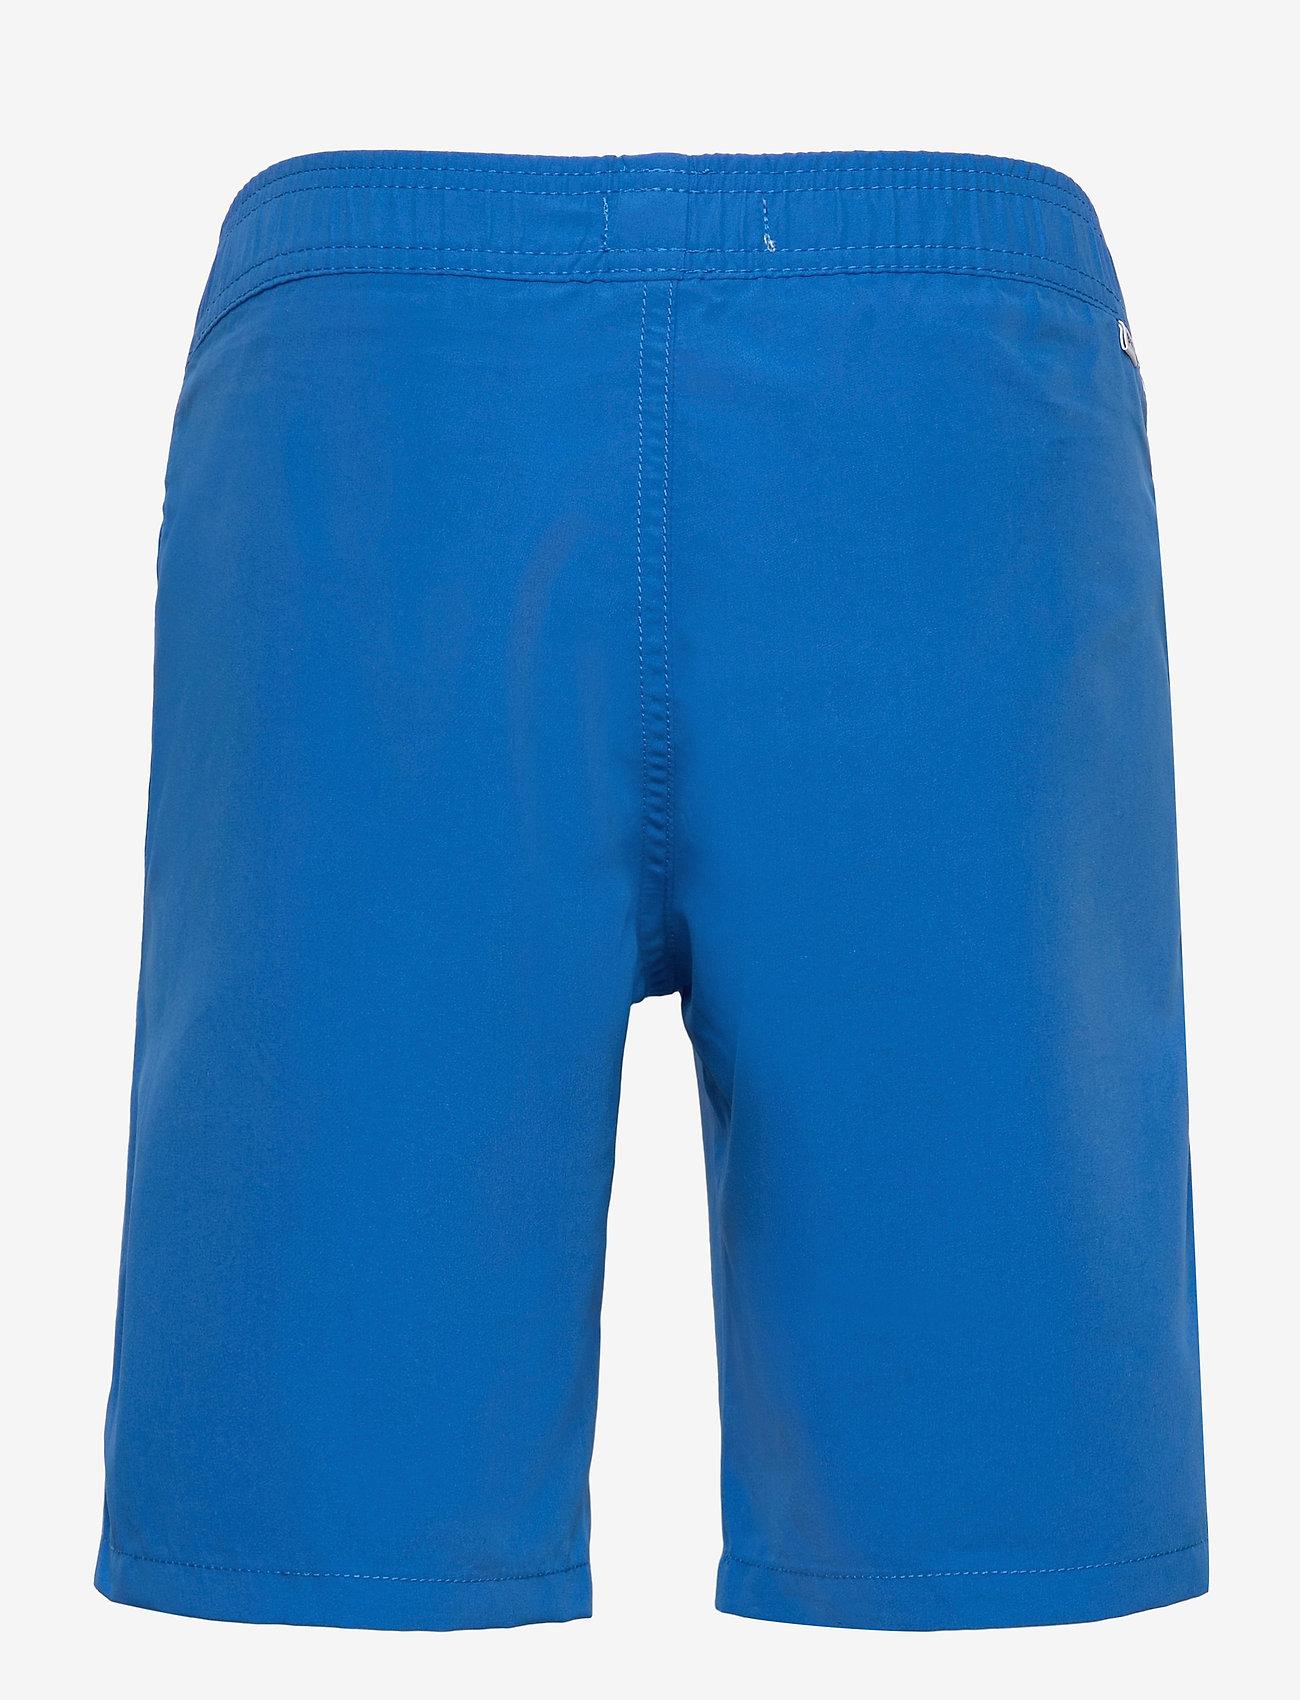 BOSS - SWIM SHORTS - badehosen - pale blue - 1